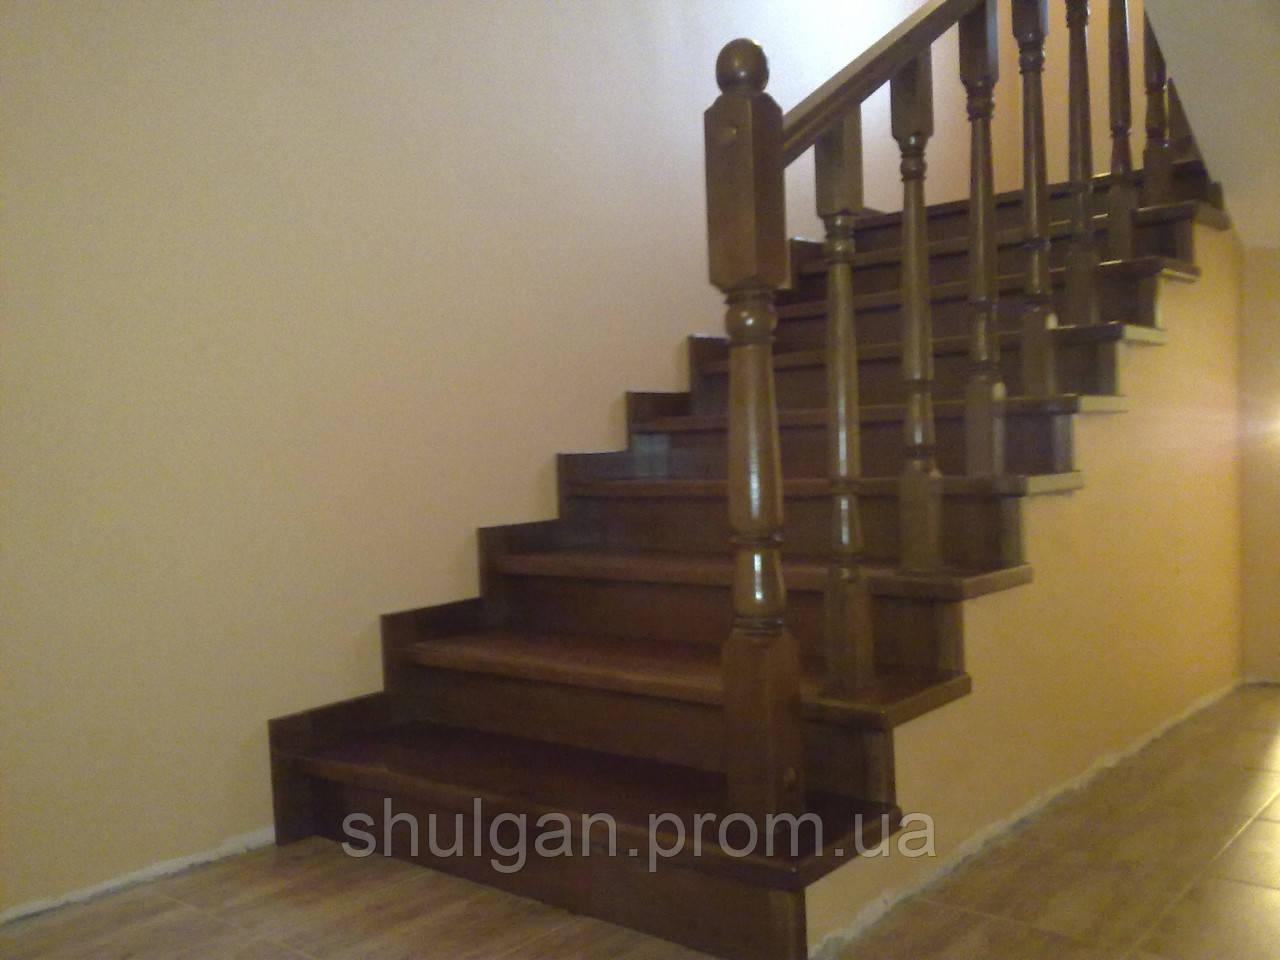 Лестница по бетону, 4 марша - Дерев'яні двері, сходи, меблі / Деревянные двери, лестницы, мебель в Волынской области